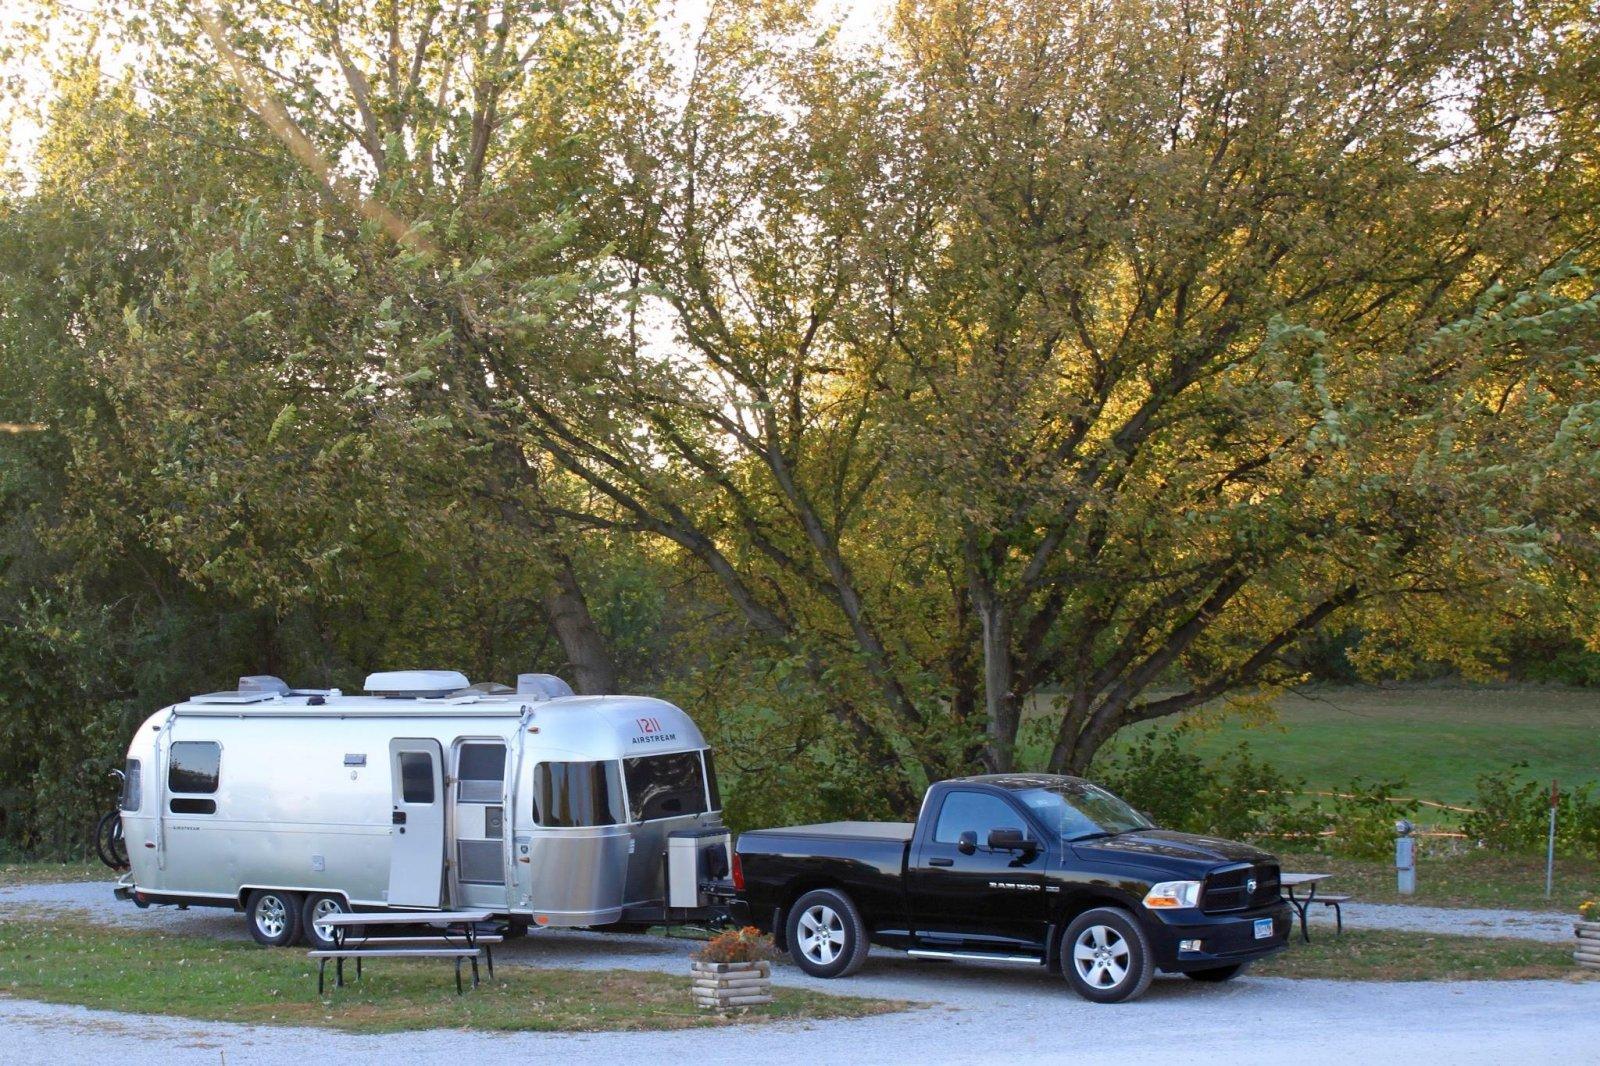 Click image for larger version  Name:Airstream:Nebraska.jpg Views:60 Size:499.6 KB ID:254090